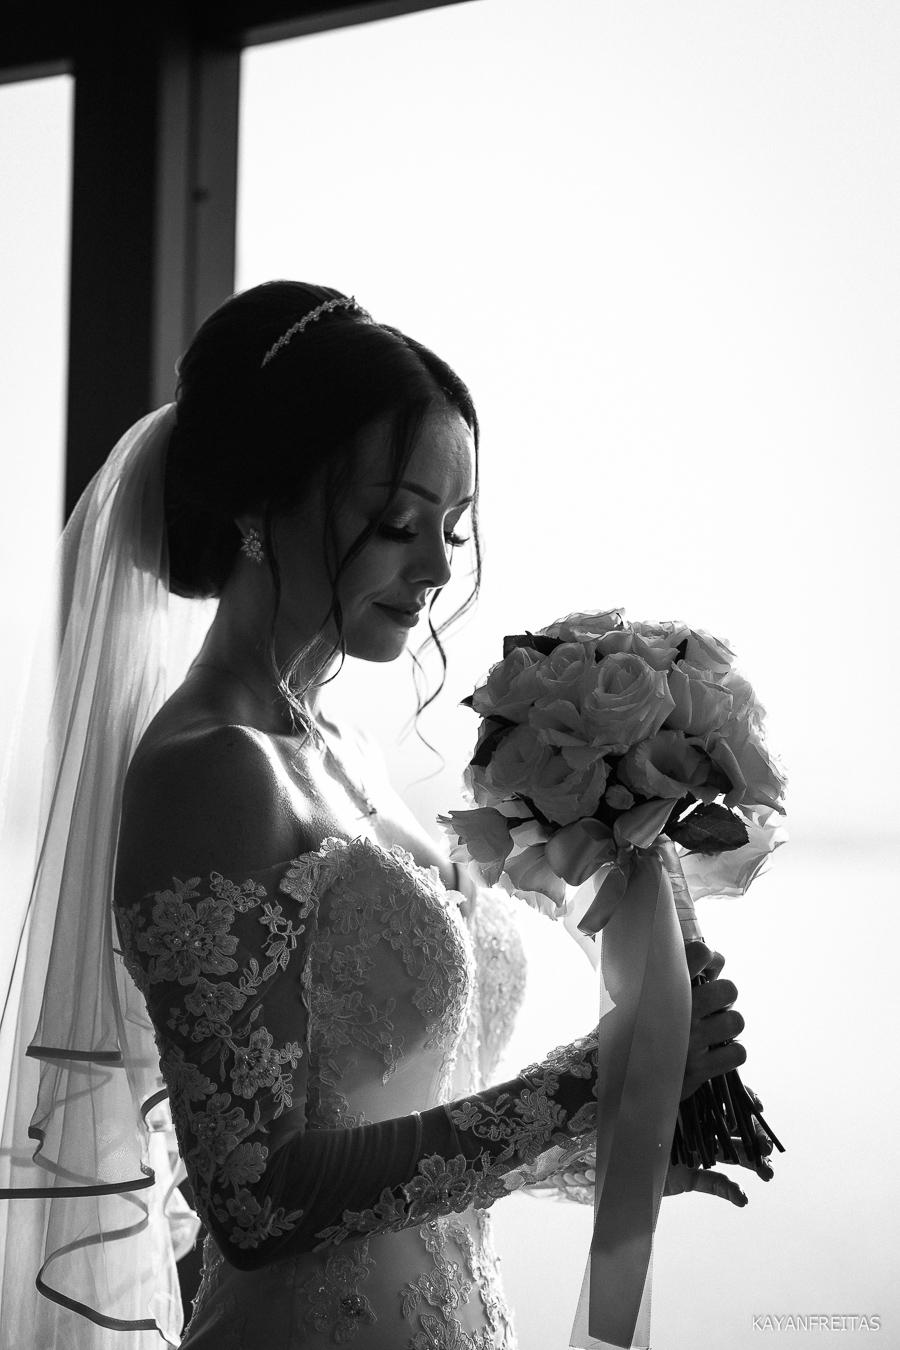 casamento-indaia-floripa-0028 Casamento Indaiá Florianópolis - Deise e Dário